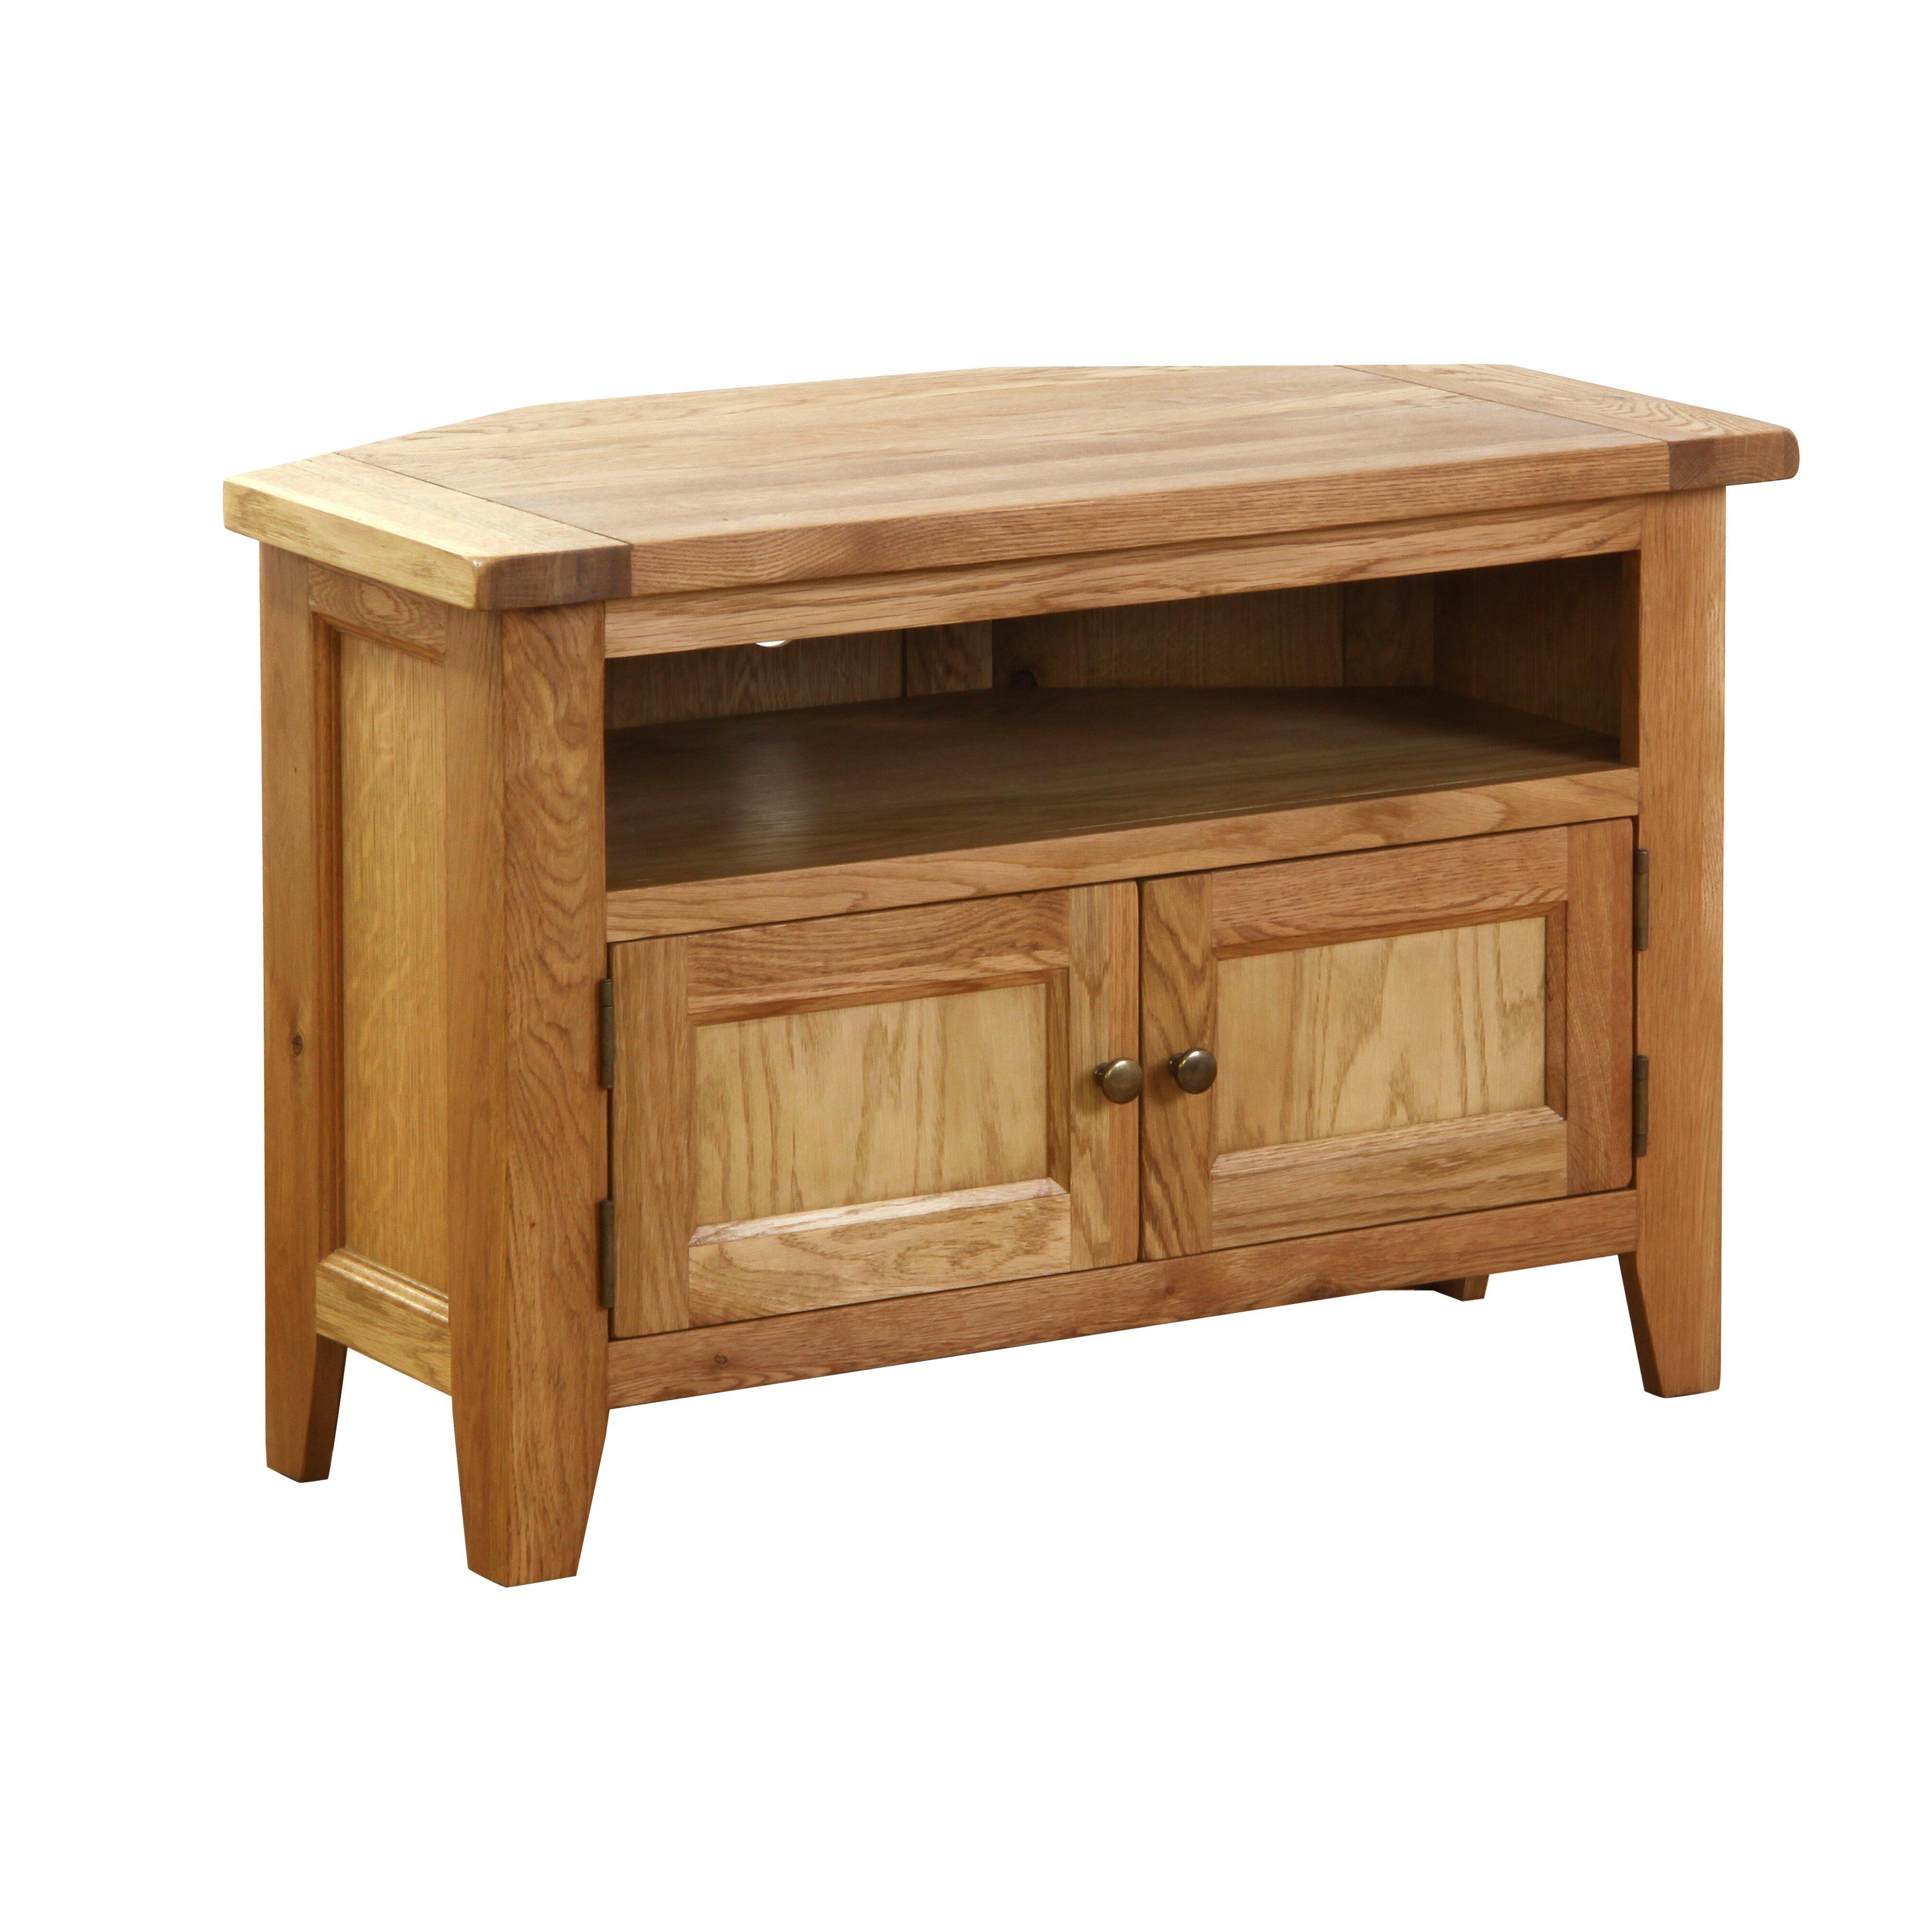 alpenhome millais petite tv cabinets wayfair uk. Black Bedroom Furniture Sets. Home Design Ideas